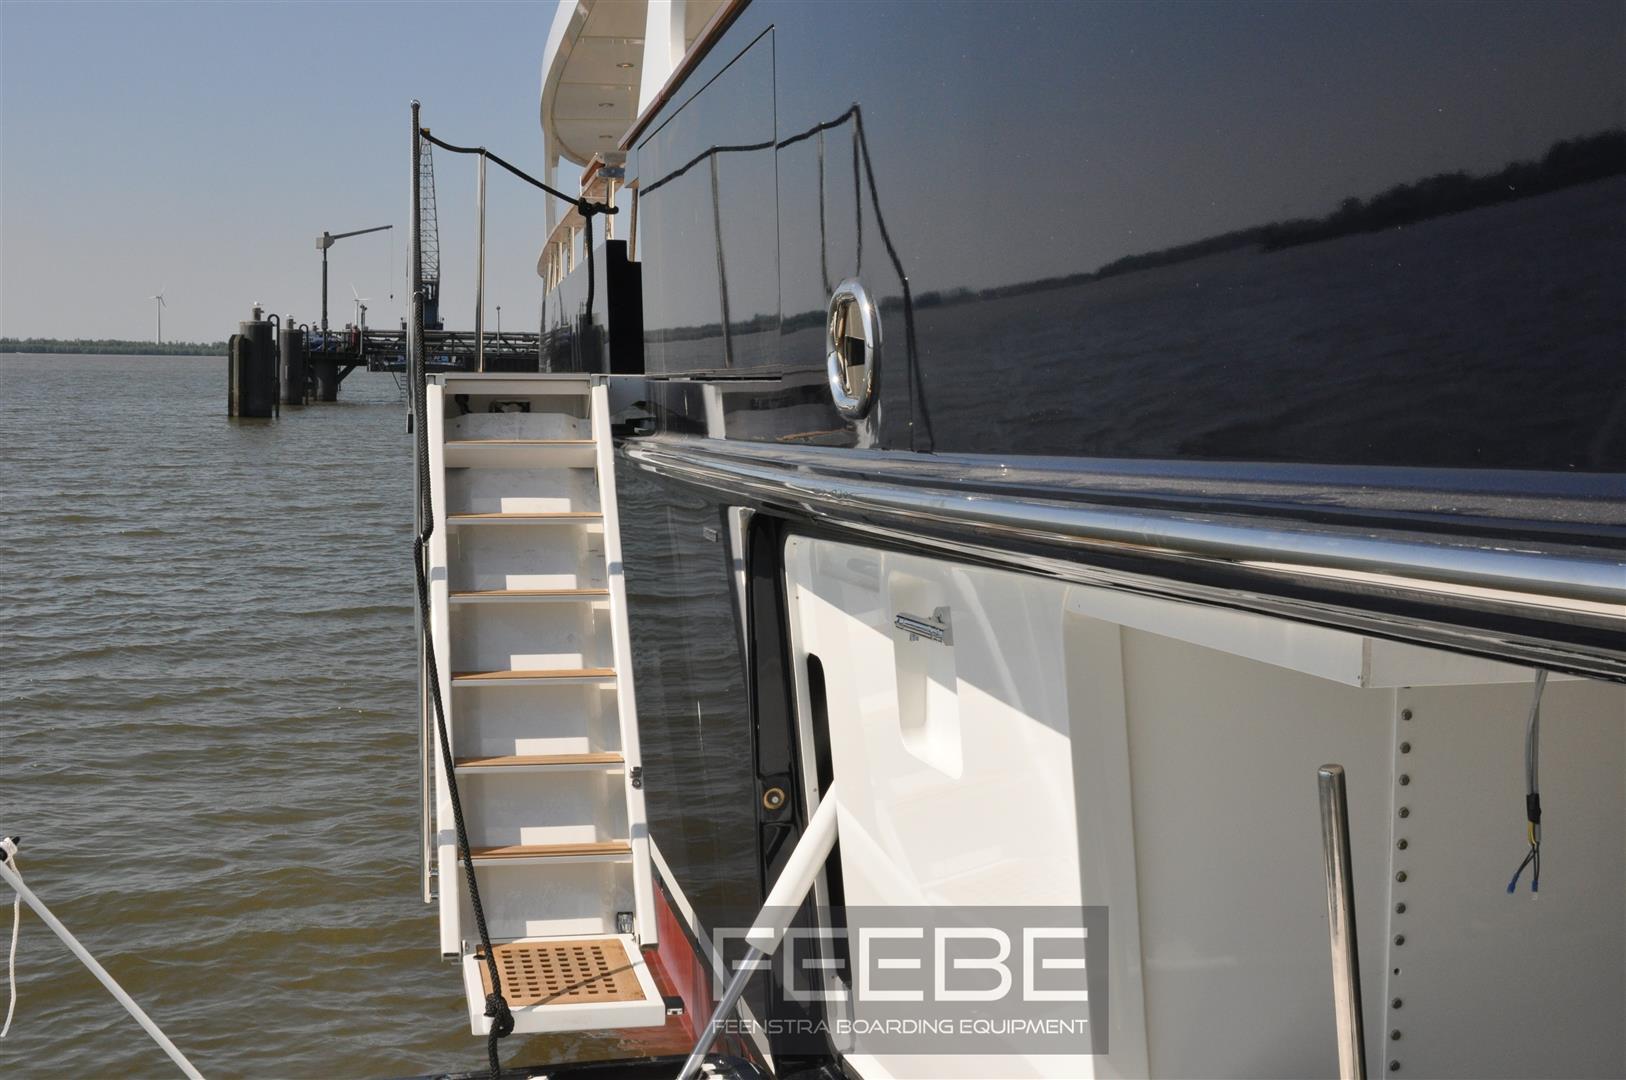 Heliad Ii Yacht Feebe Boarding Ladder Yacht Charter